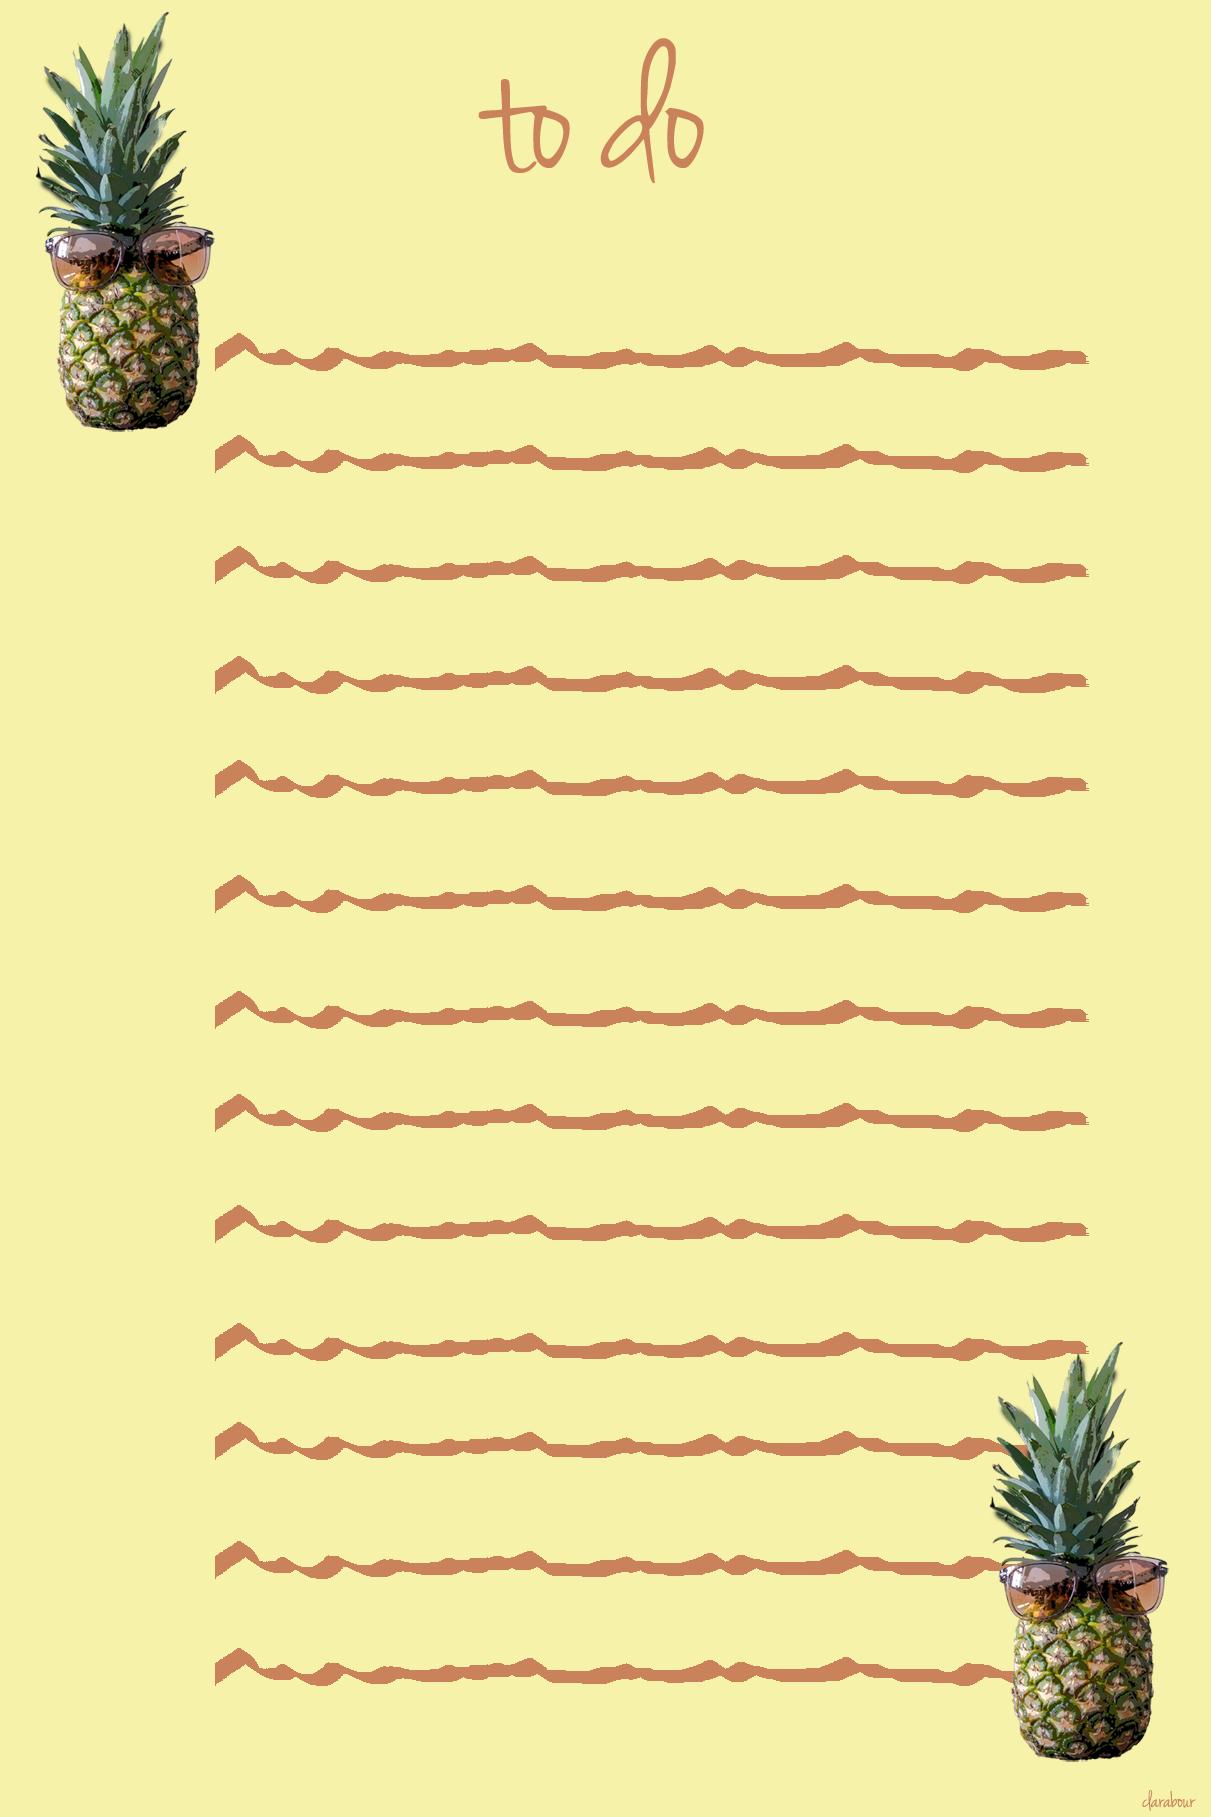 pineapple, sunglasses, to do liste, blogger, downloadable, freebie, kostenlos